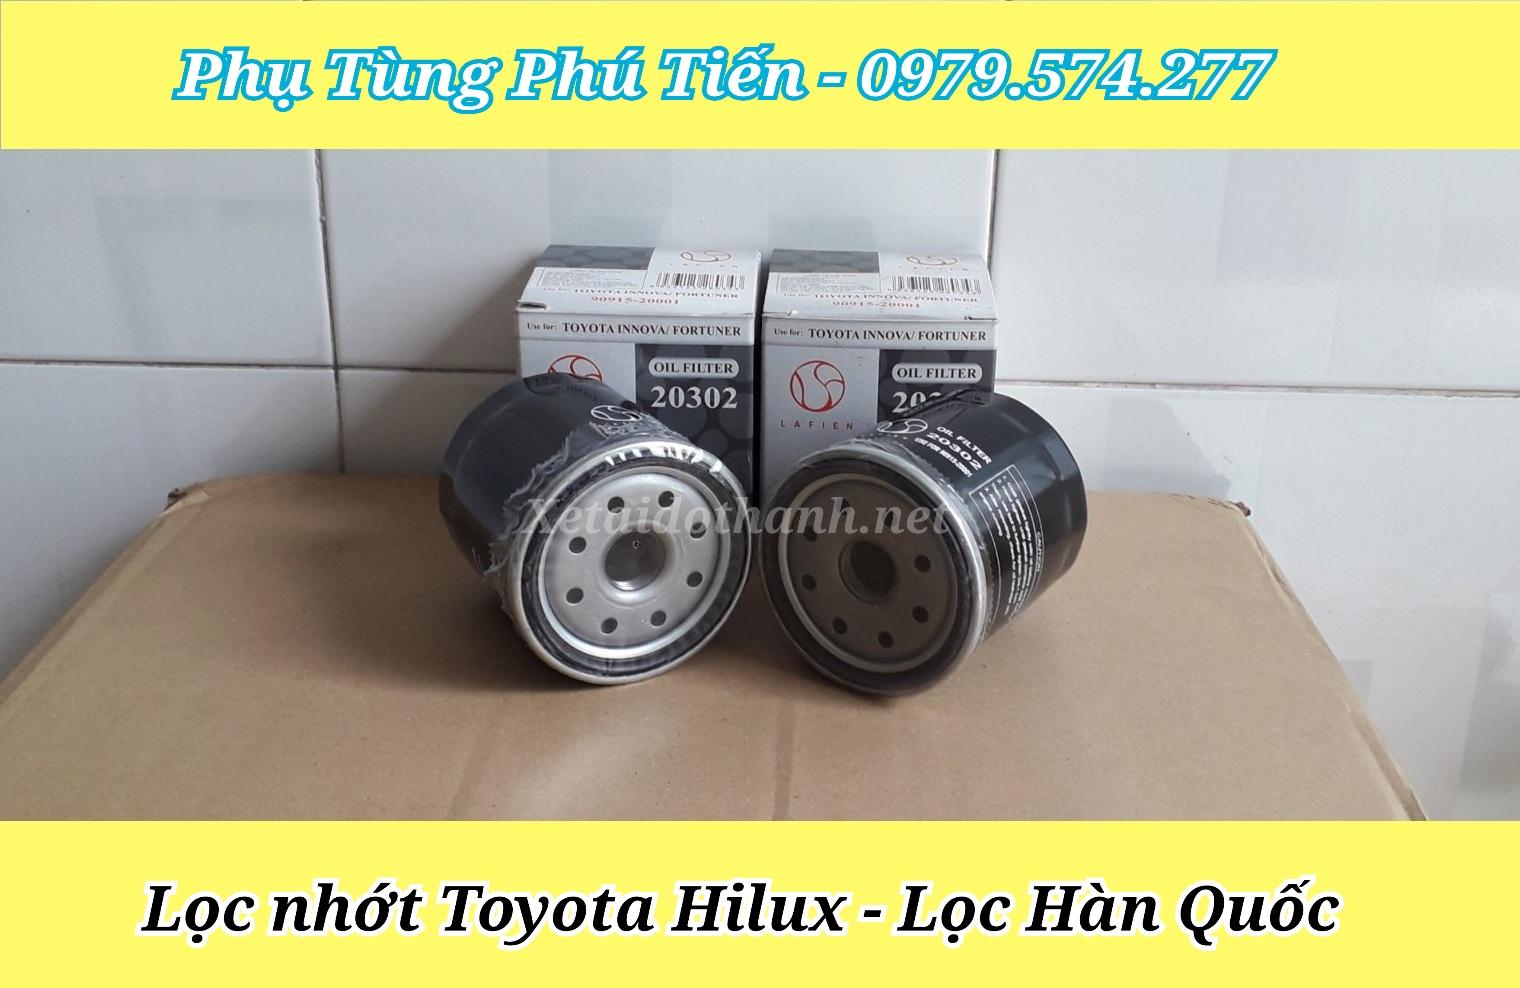 Lọc Nhớt Toyota Hilux